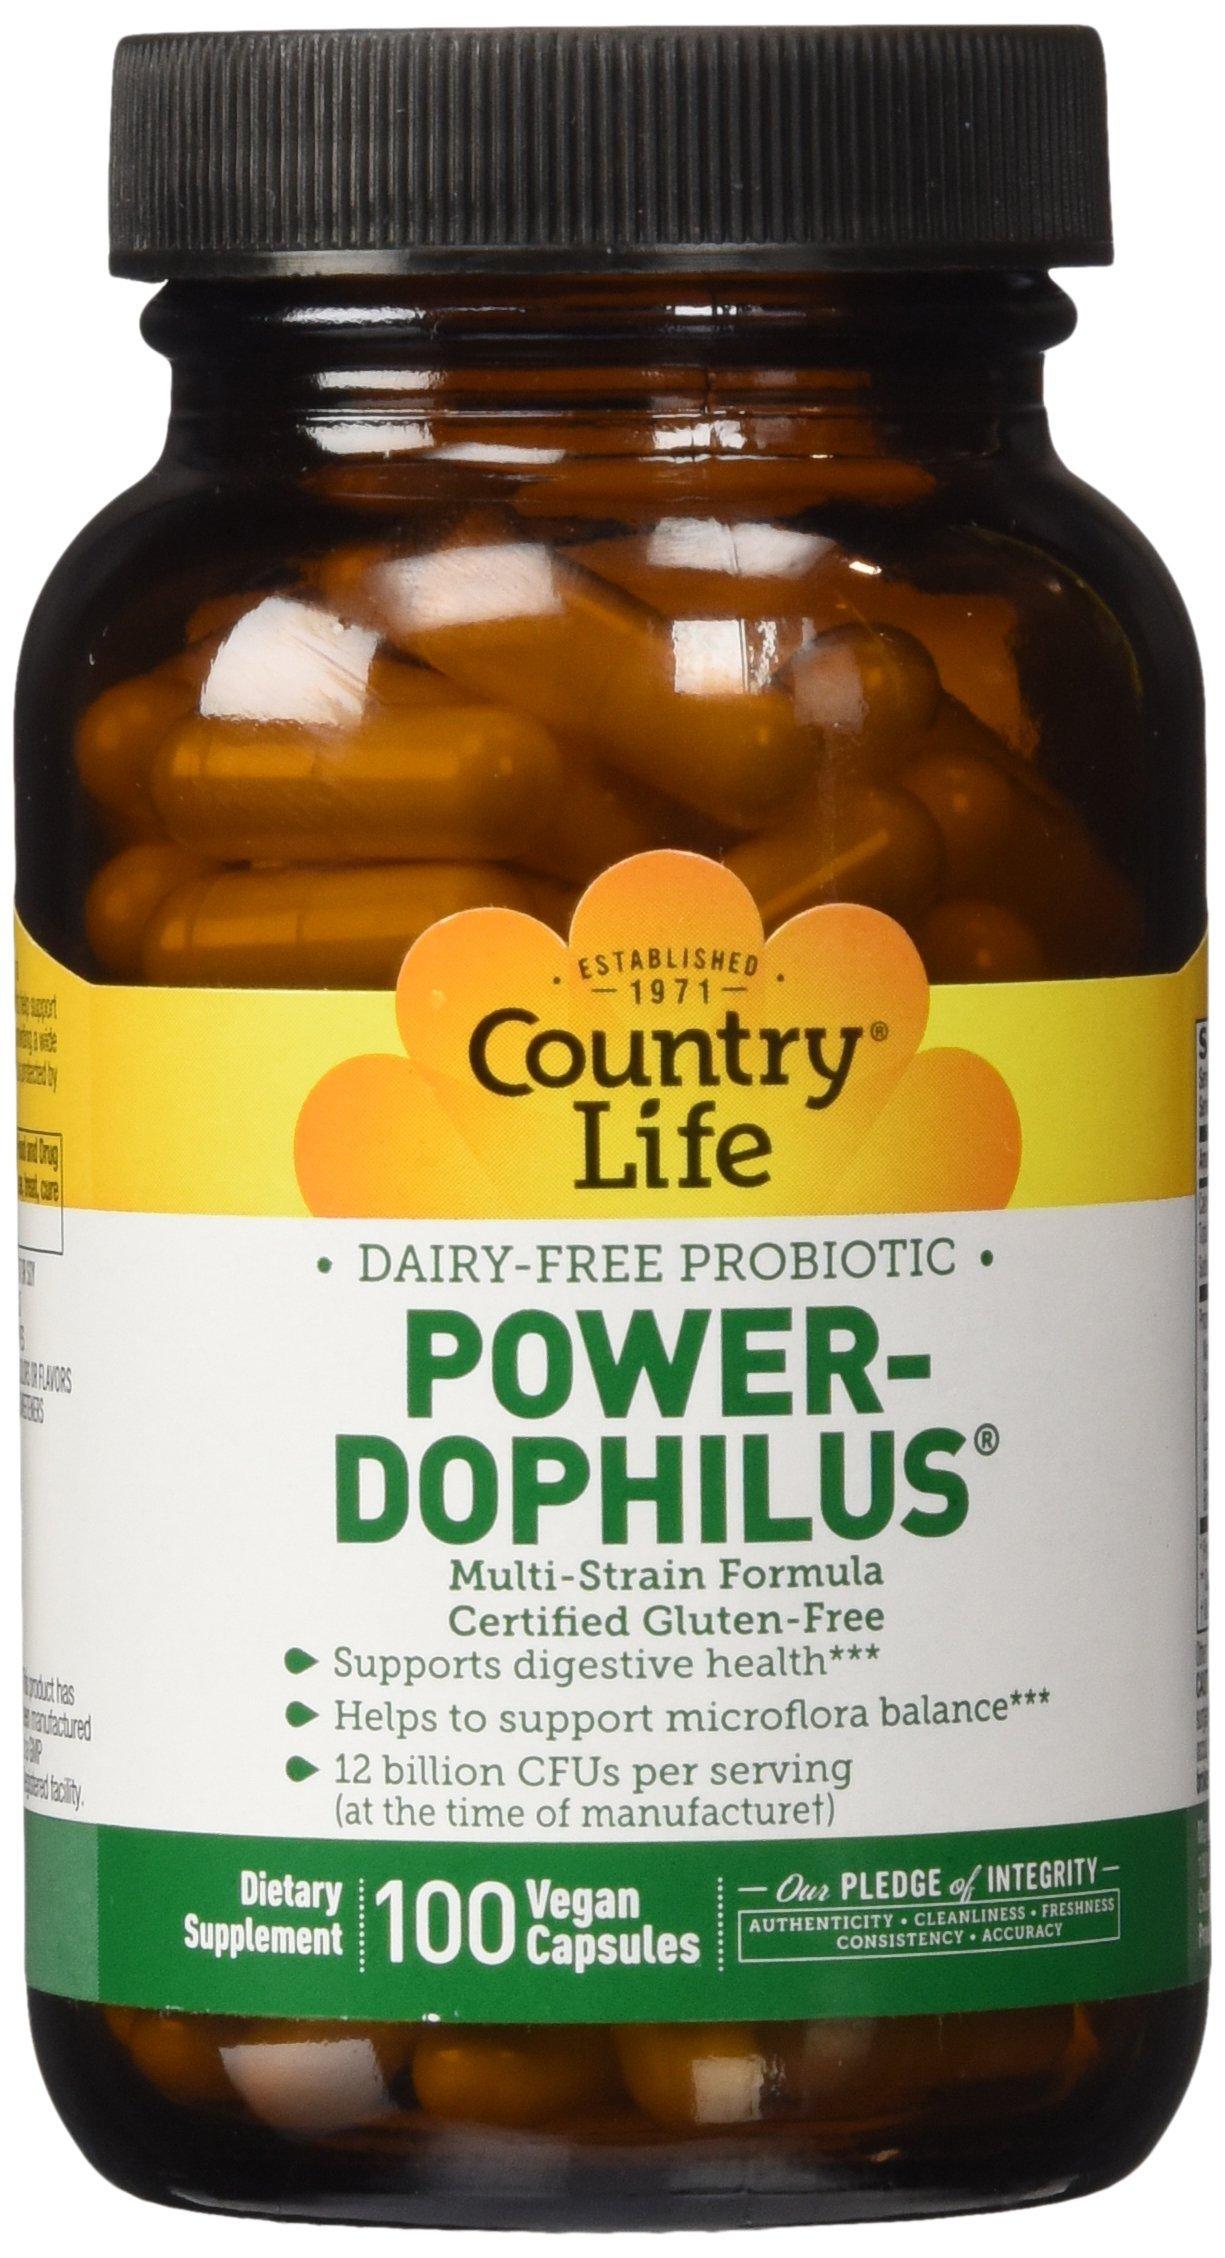 Country Life - Power-Dophilus Dairy-Free Probiotic, 12 Billion CFU's - 100 Vegan Capsules